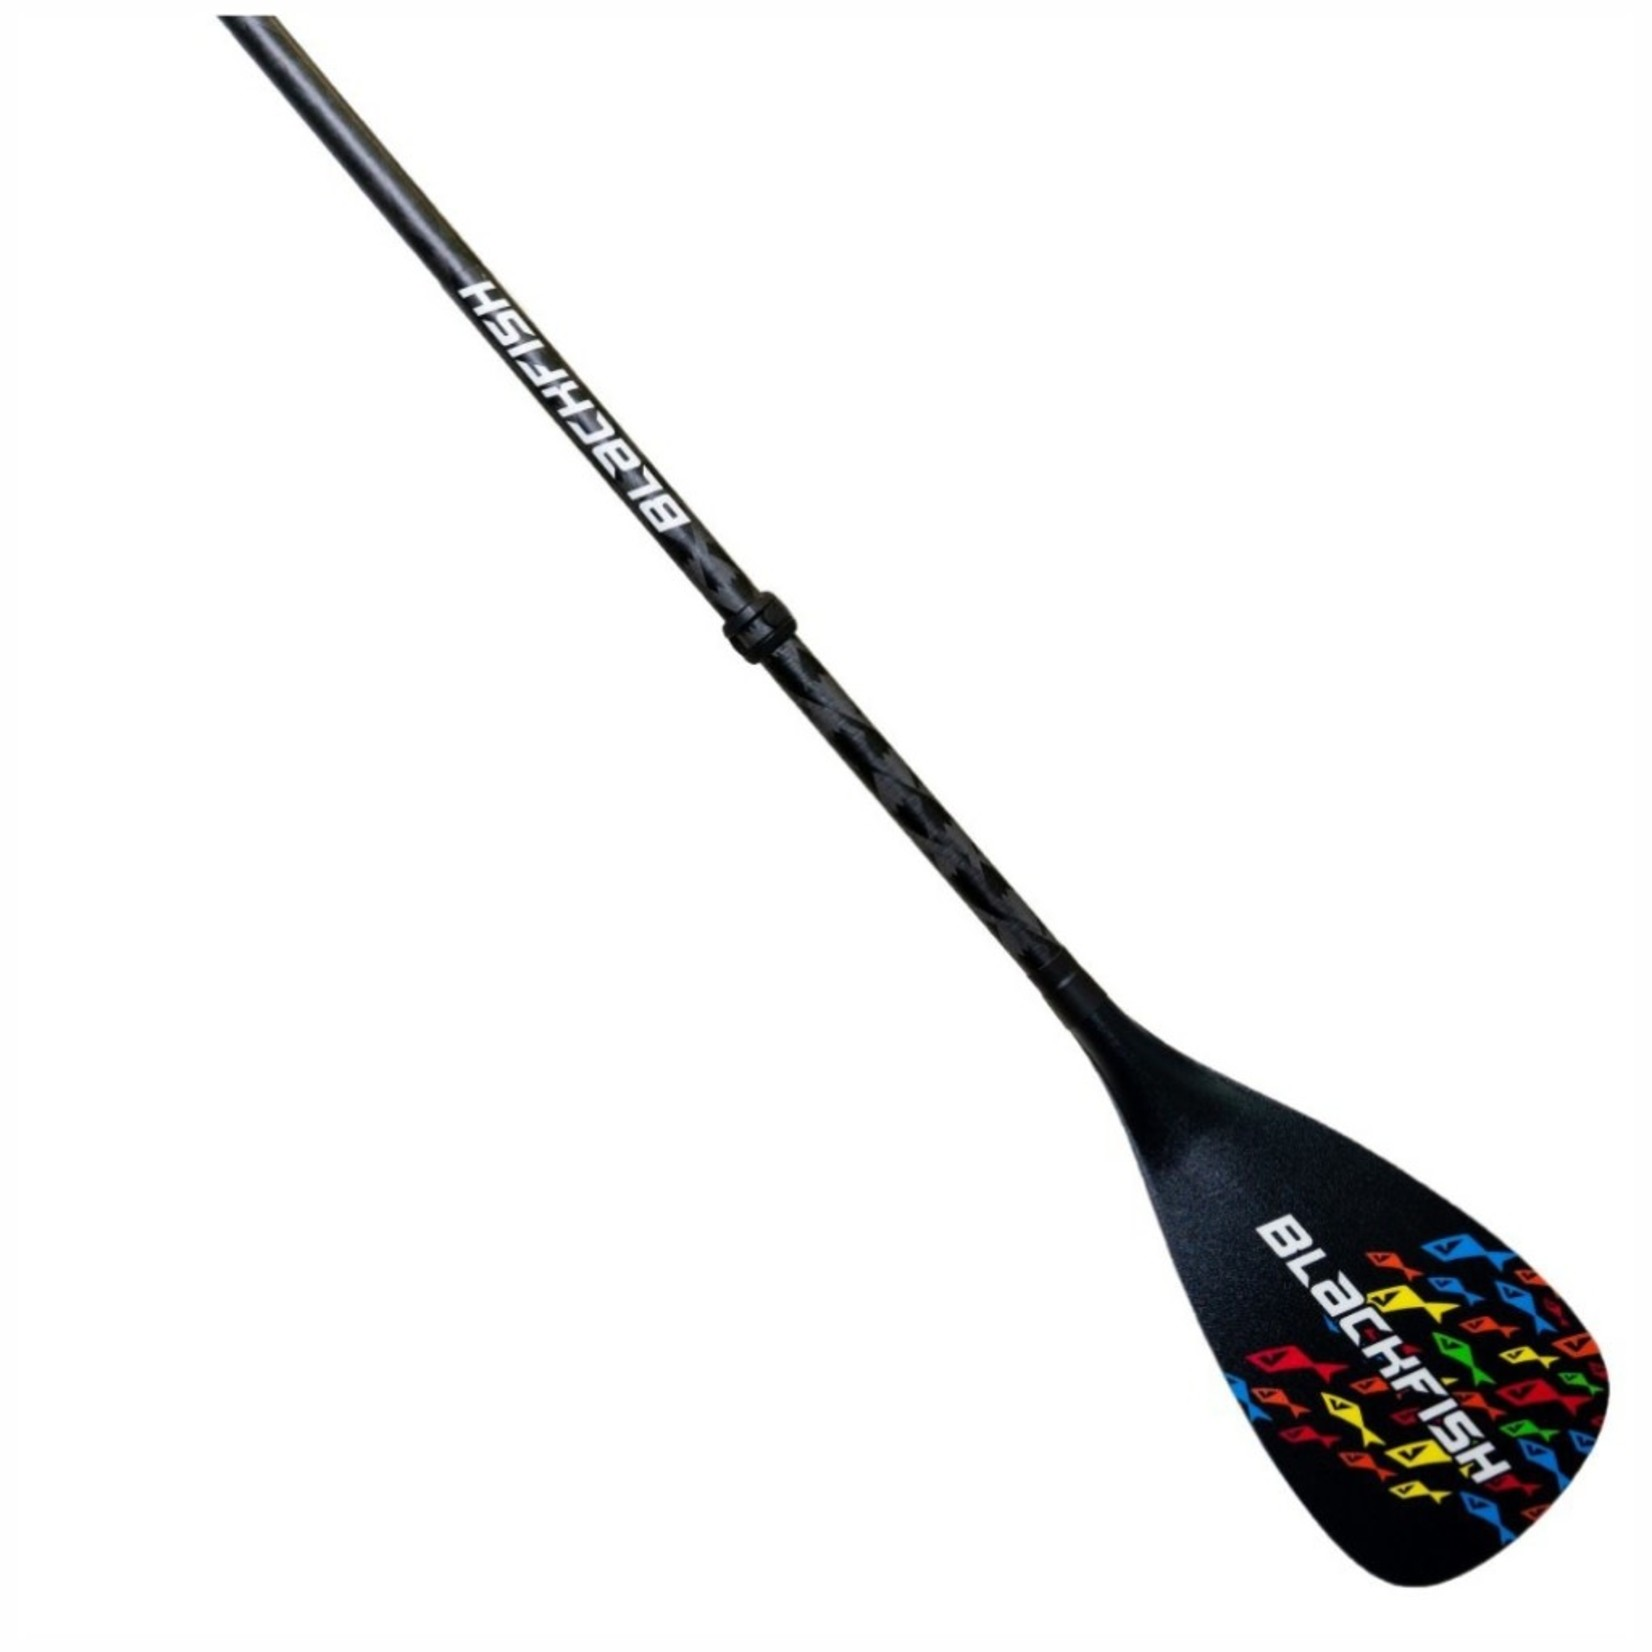 Blackfish Paddles Blackfish Nootka 520 Fishskin Adjustable 3 pc. Stand Up Paddle